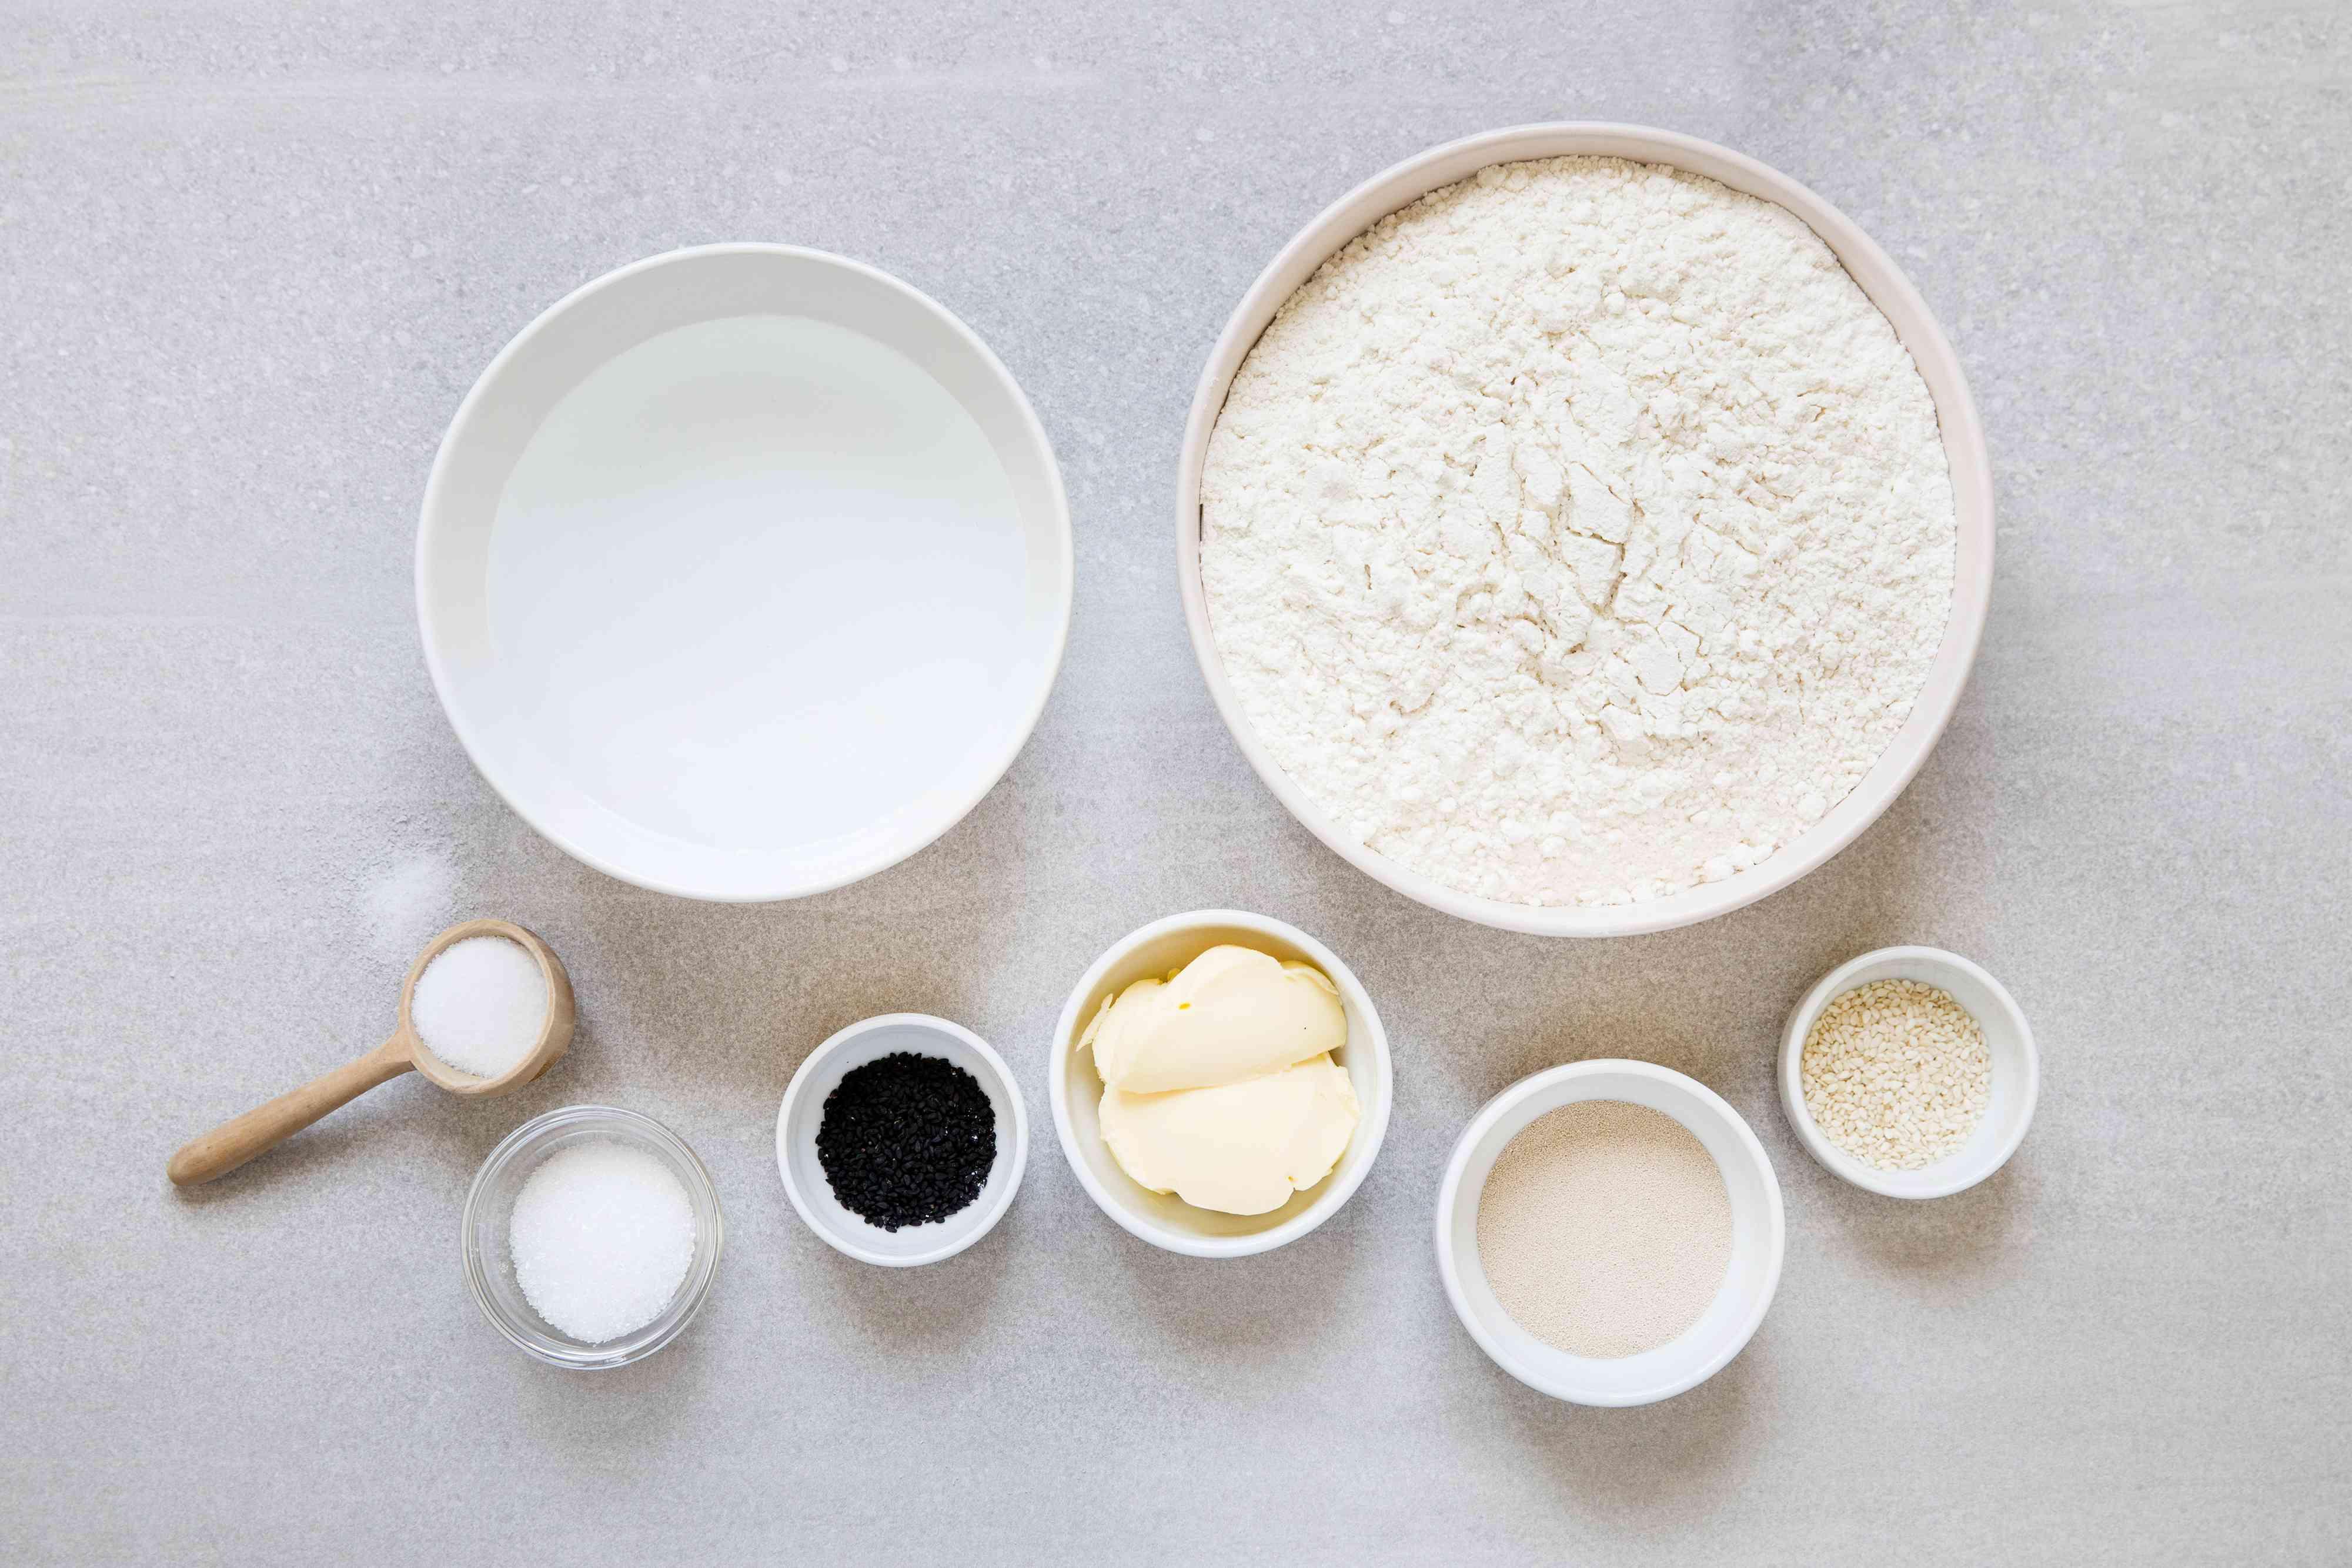 Authentic Turkish Lavas Puff Bread ingredients